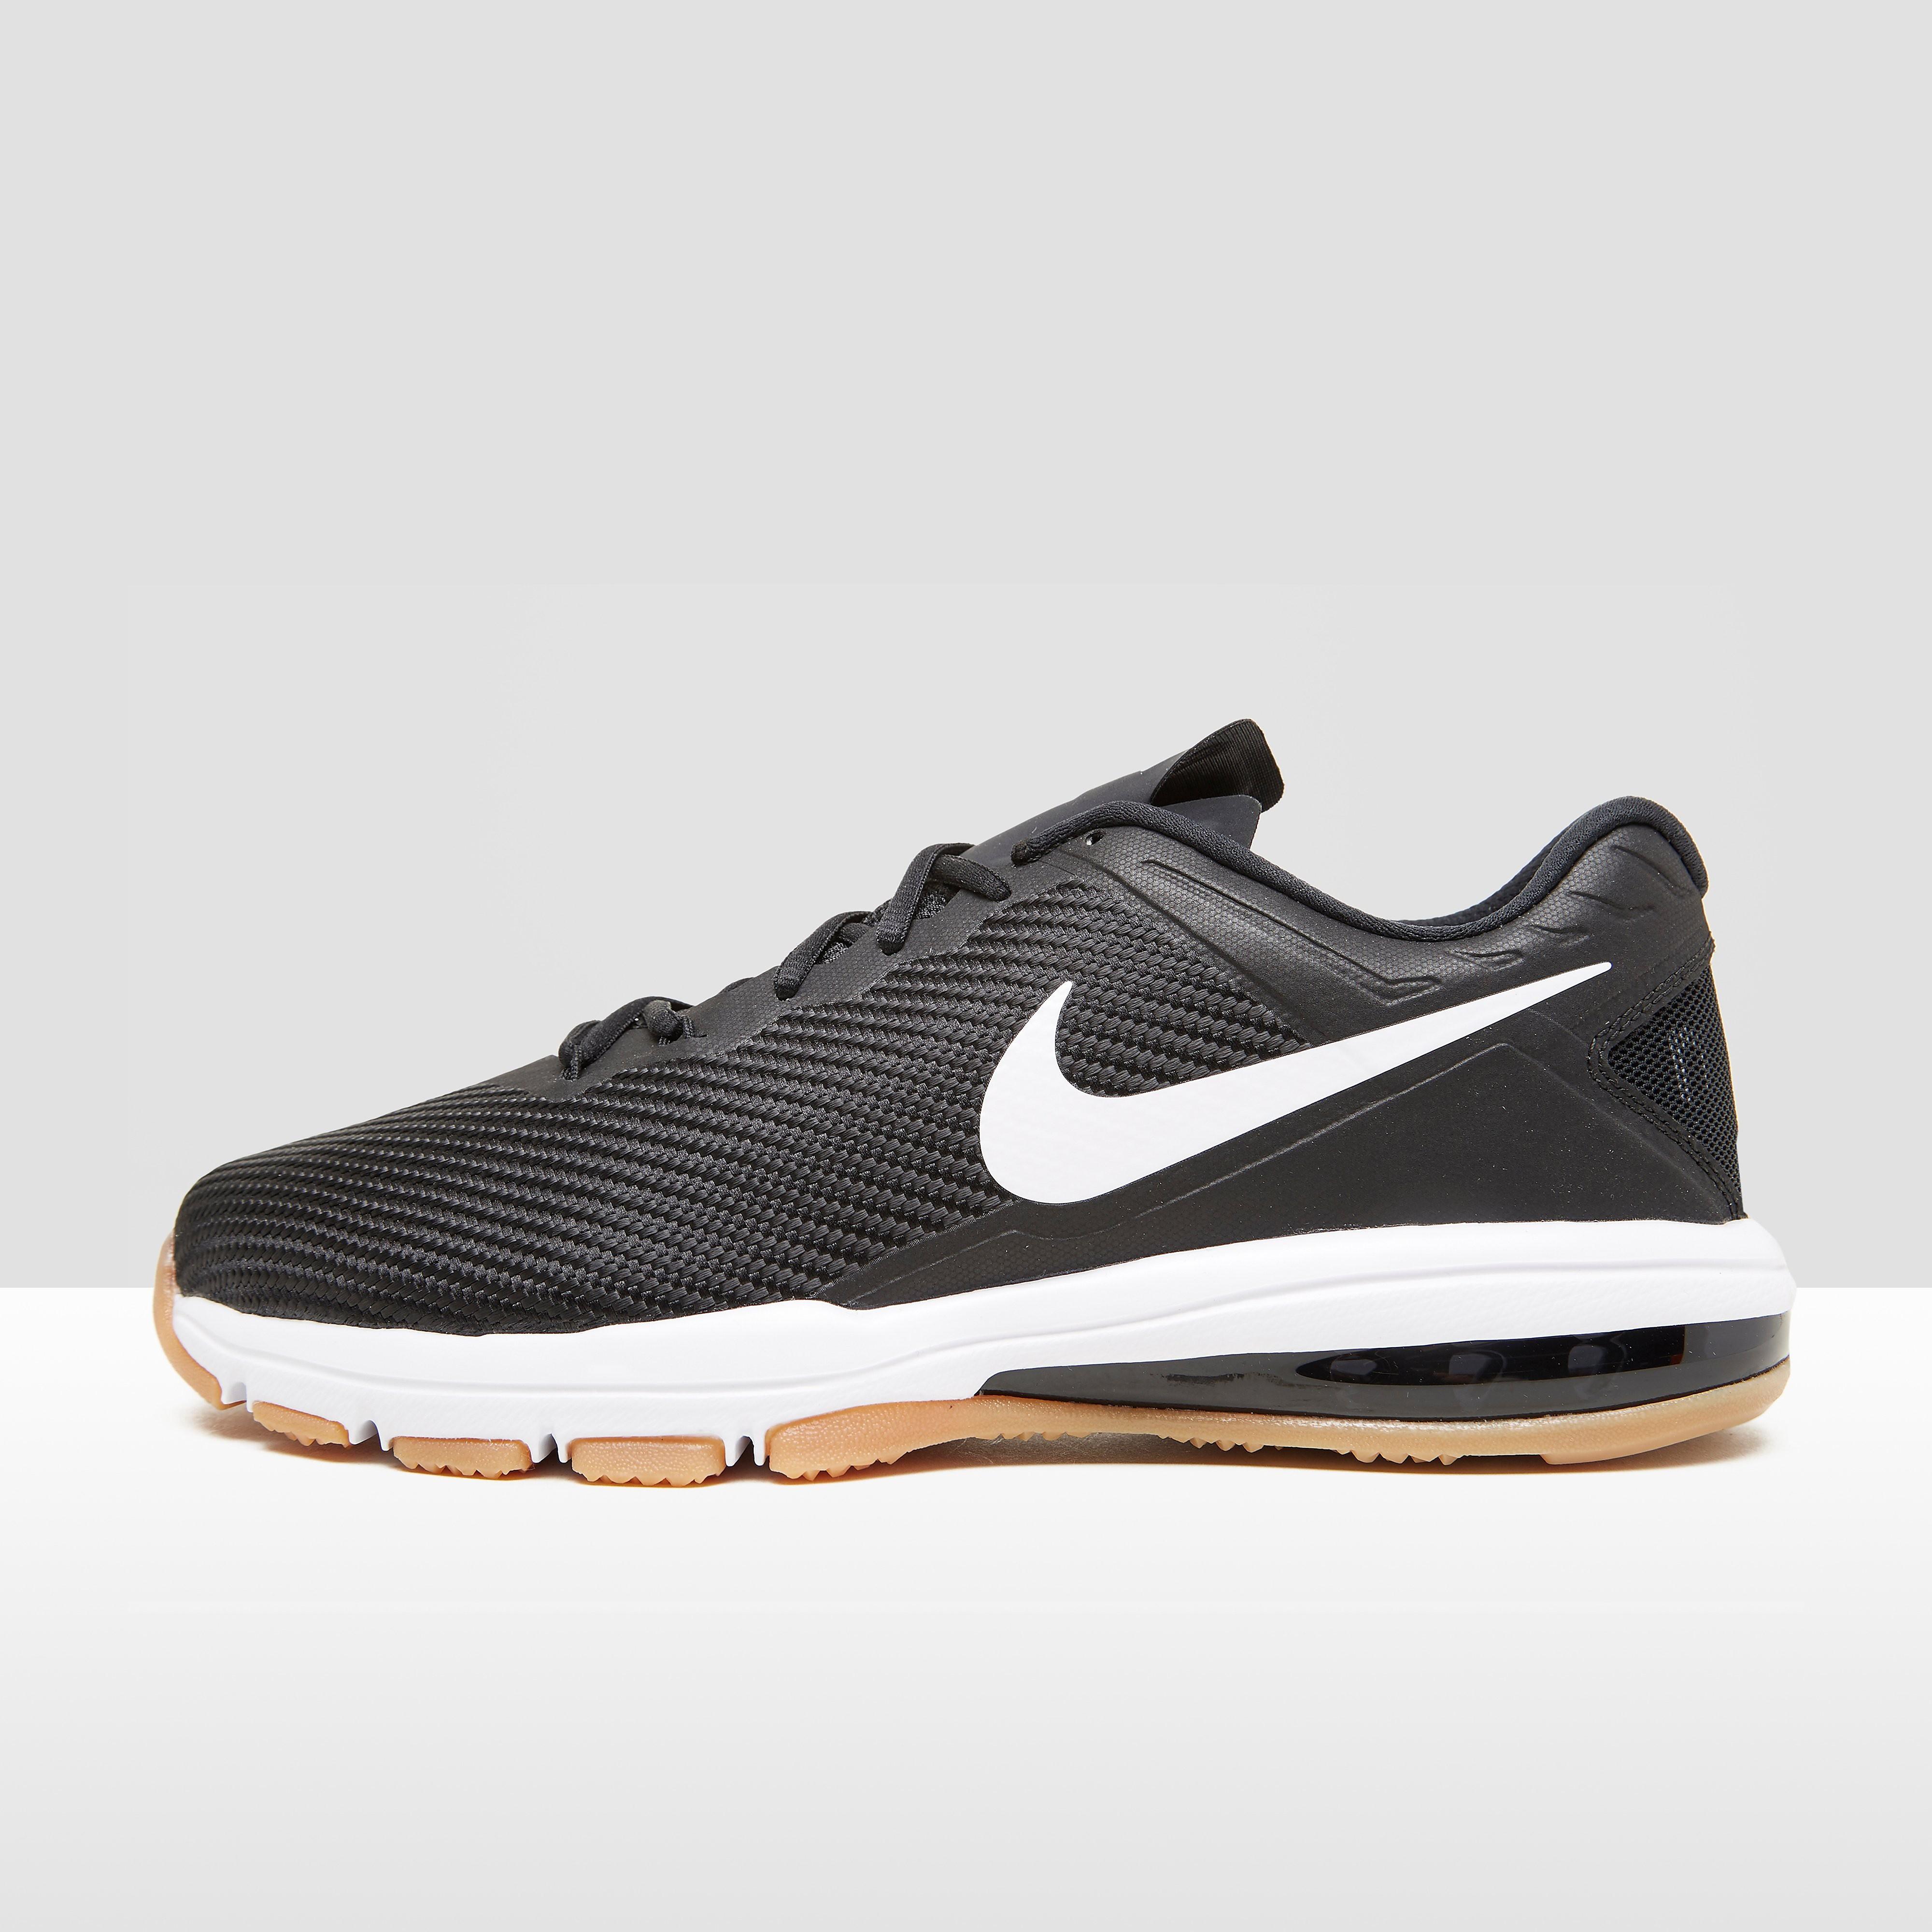 Nike - Vitesse Du Train 4 Chaussures De Formation - Hommes - Chaussures - Jaune - 40,5